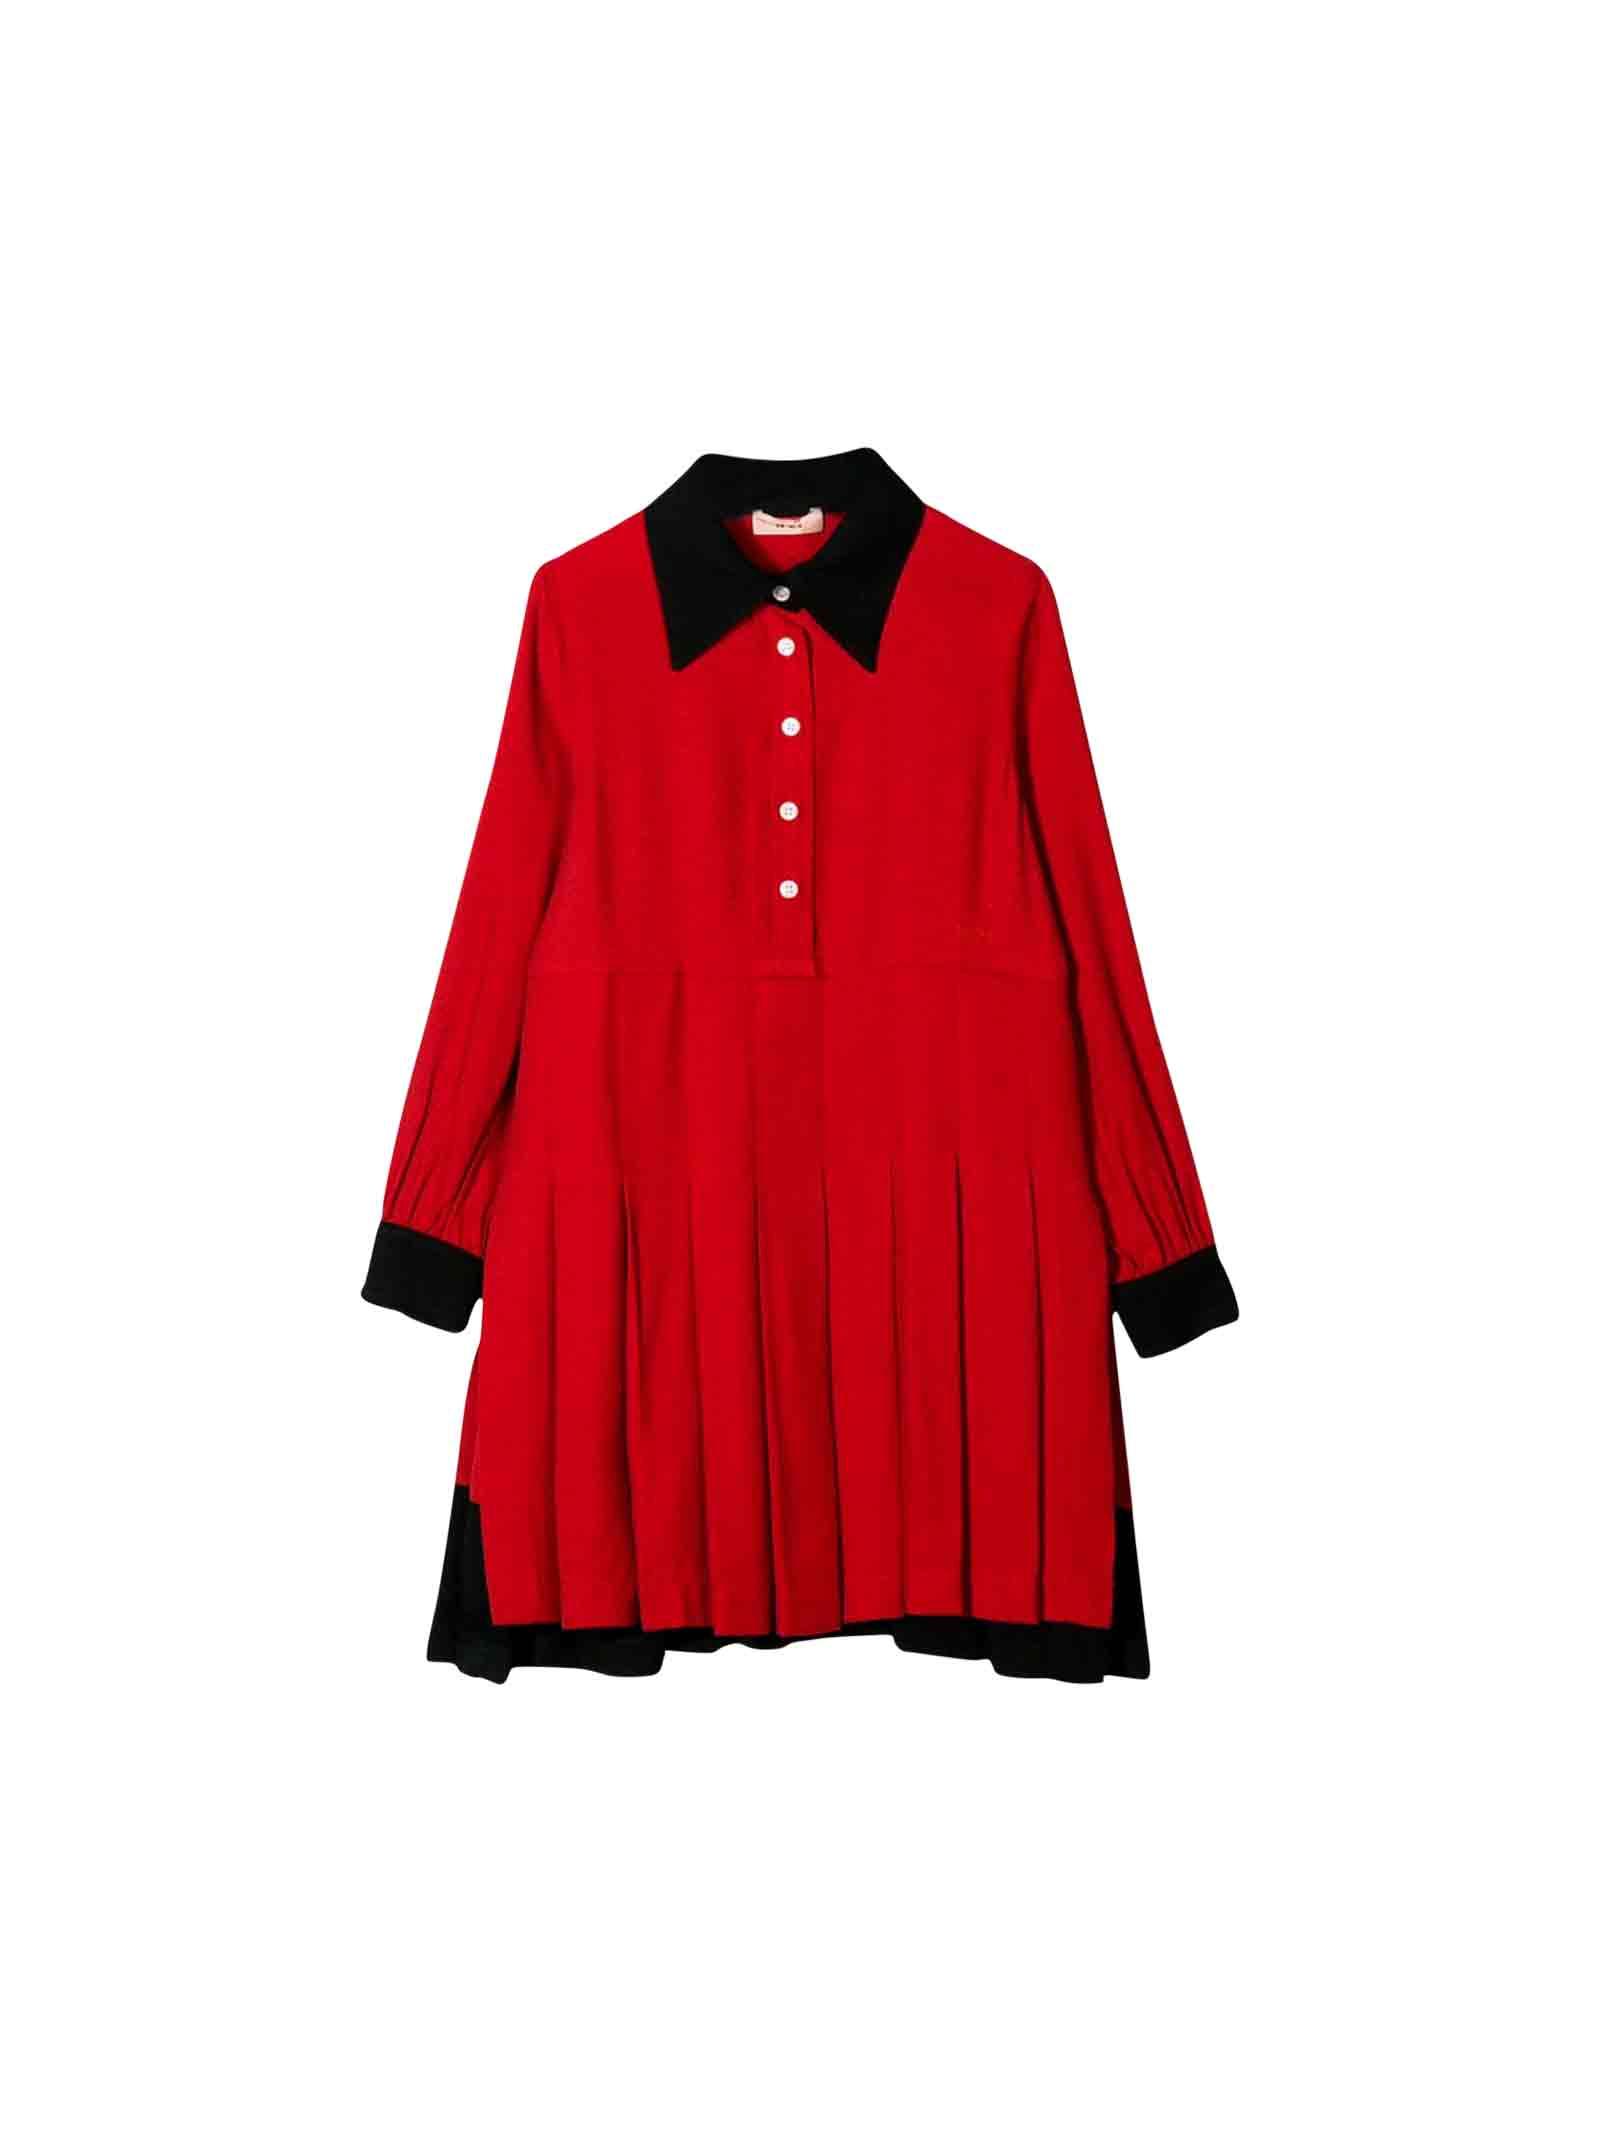 N.21 Little Girls Red Dress No. 21 Kids